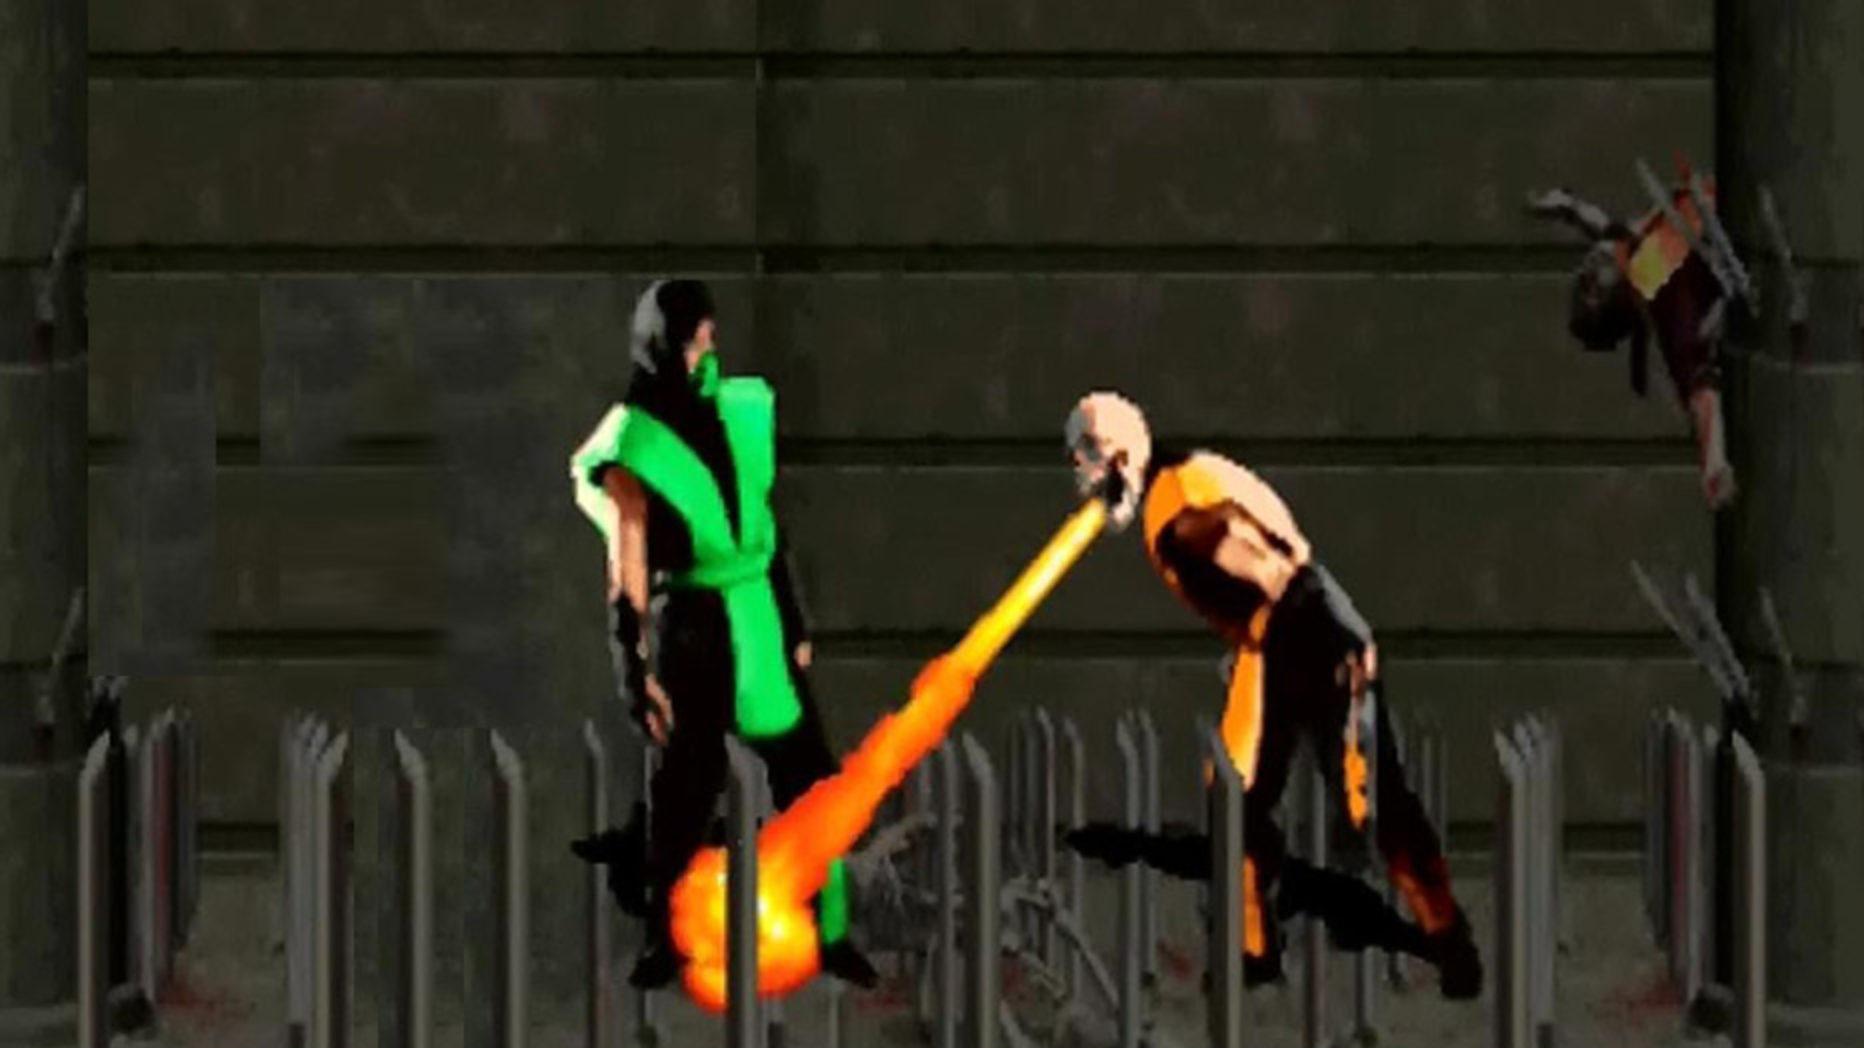 The Death of Mortal Kombat's Mystery: Pre-Orders Win. Fatality.